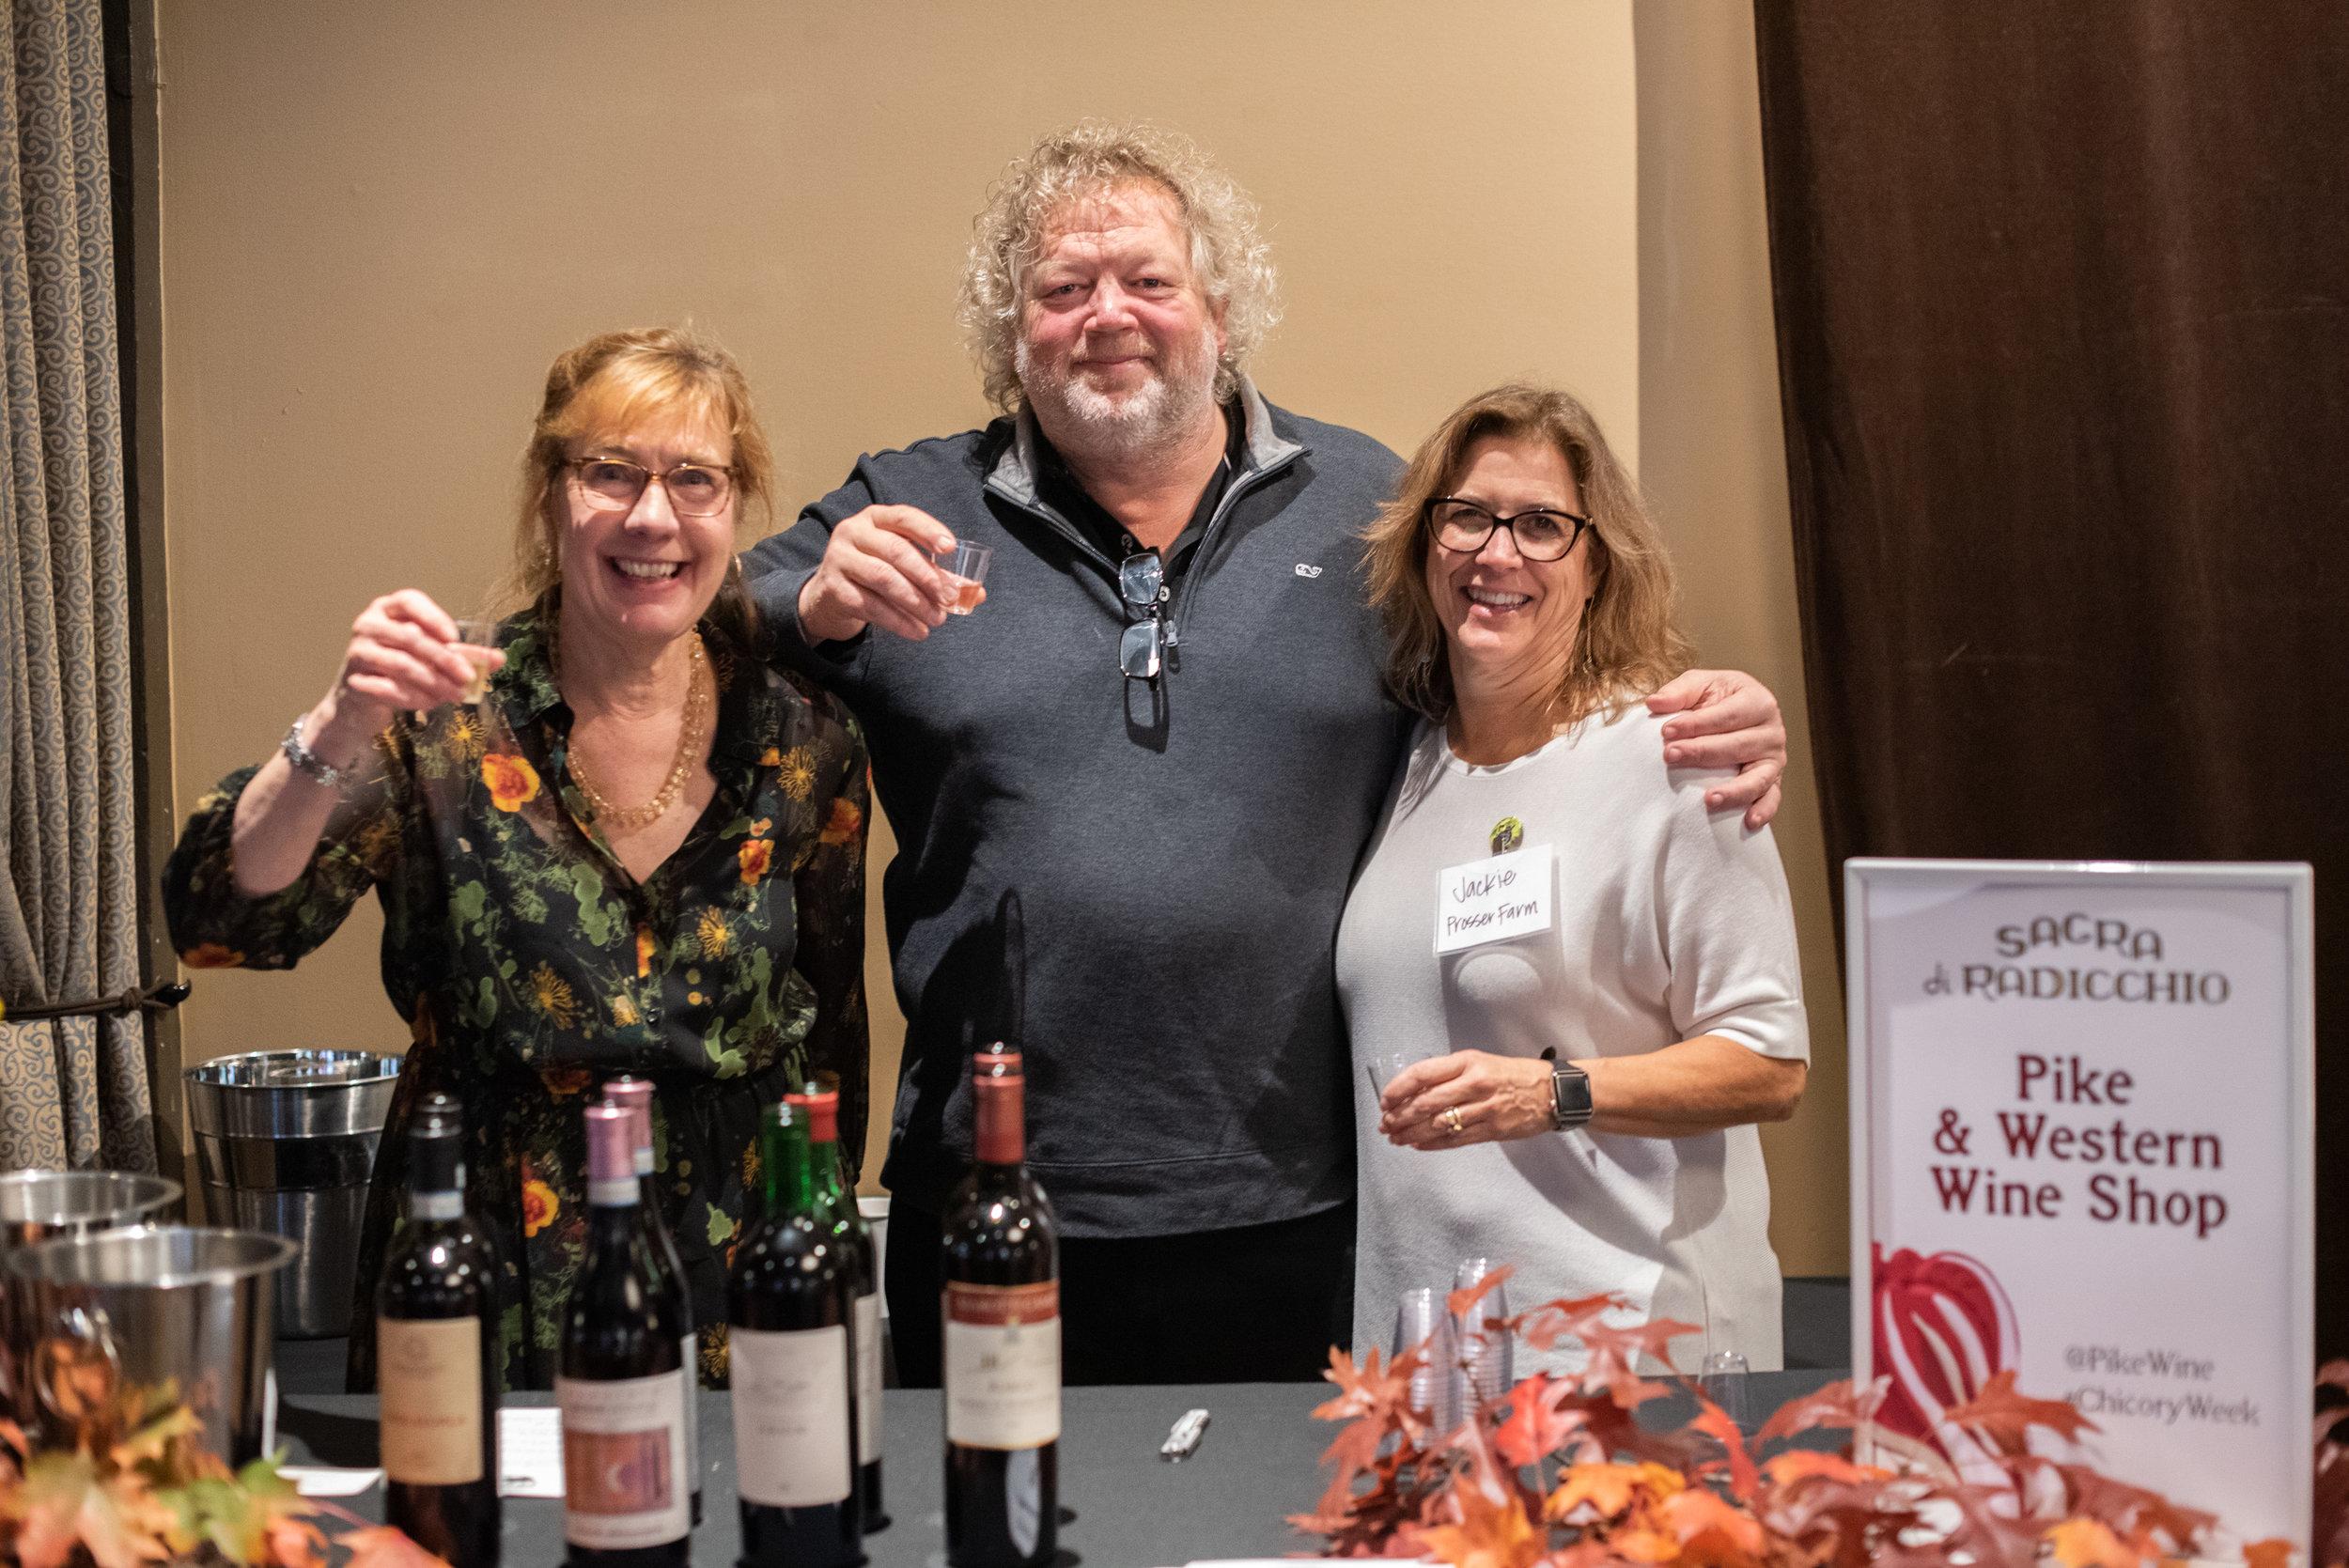 Tom & Jackie and Pike & Western wine friends.